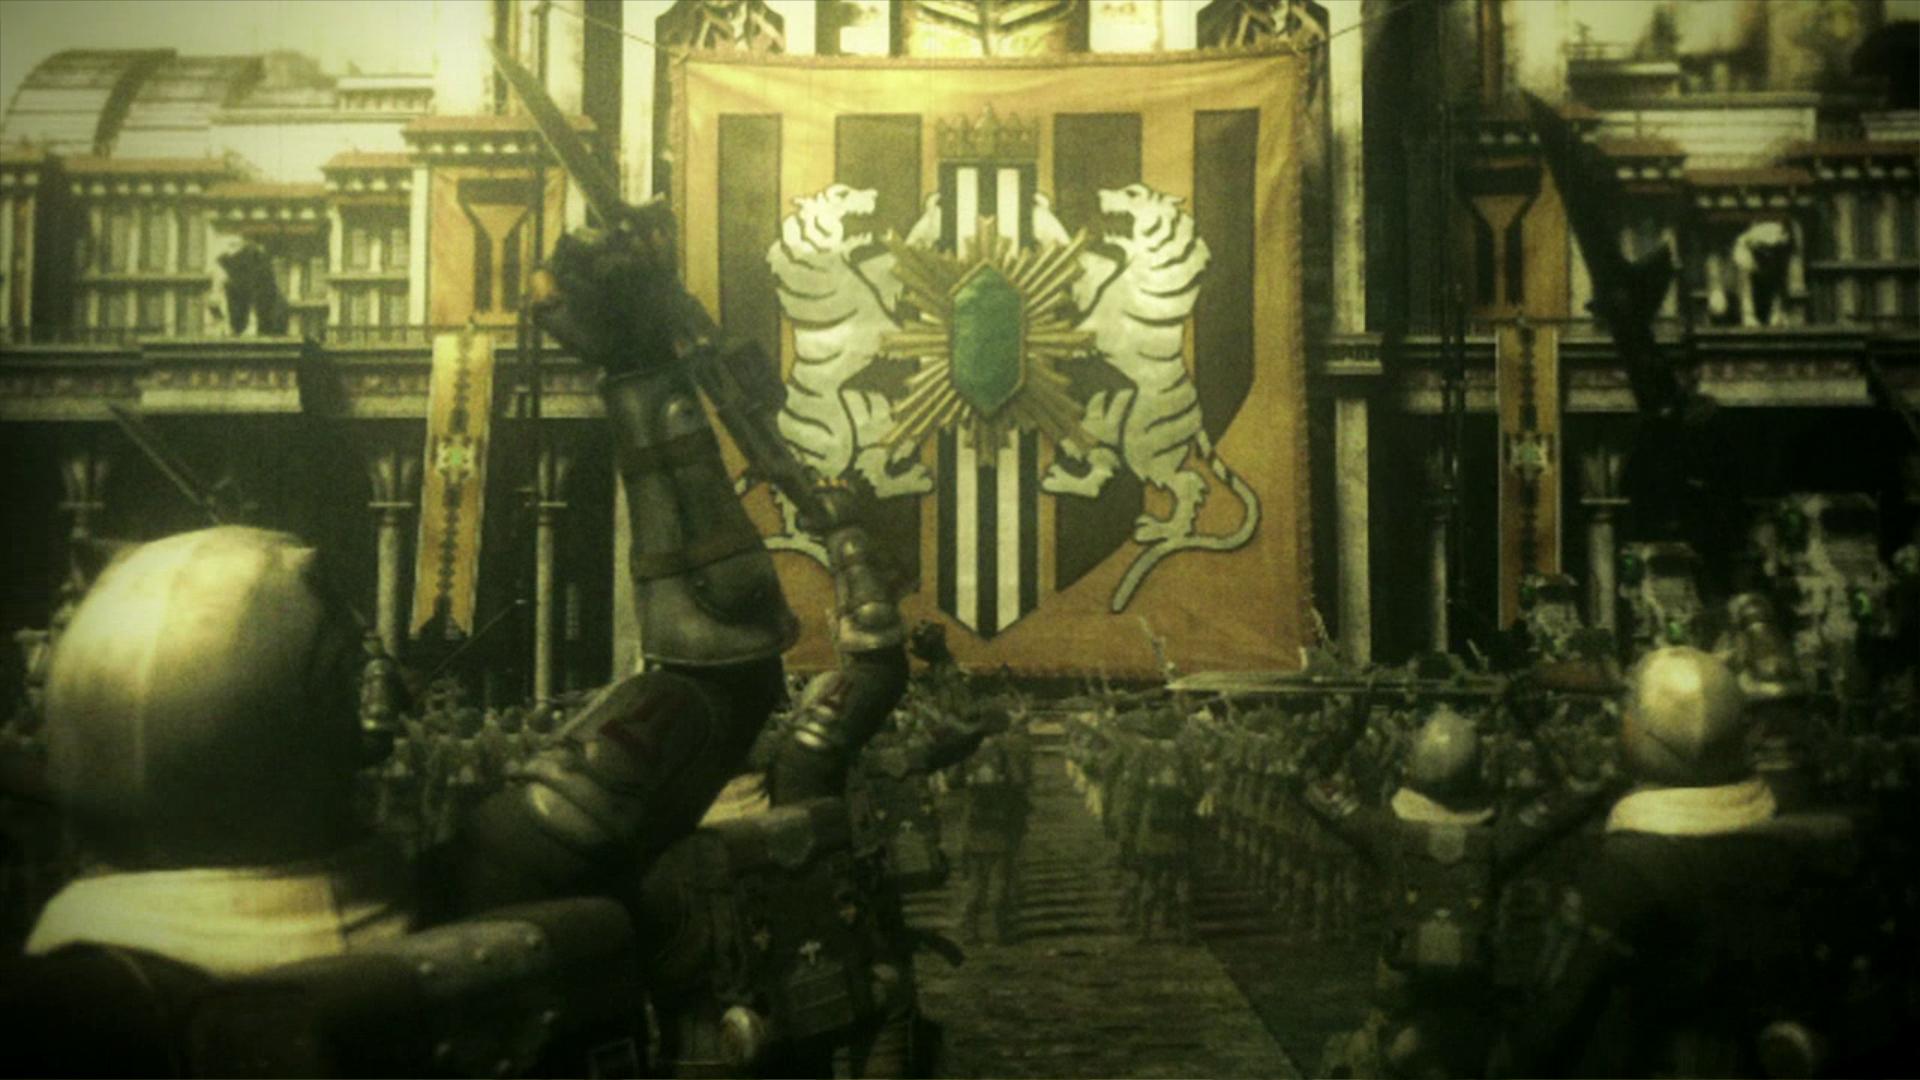 Final Fantasy Type-0 story